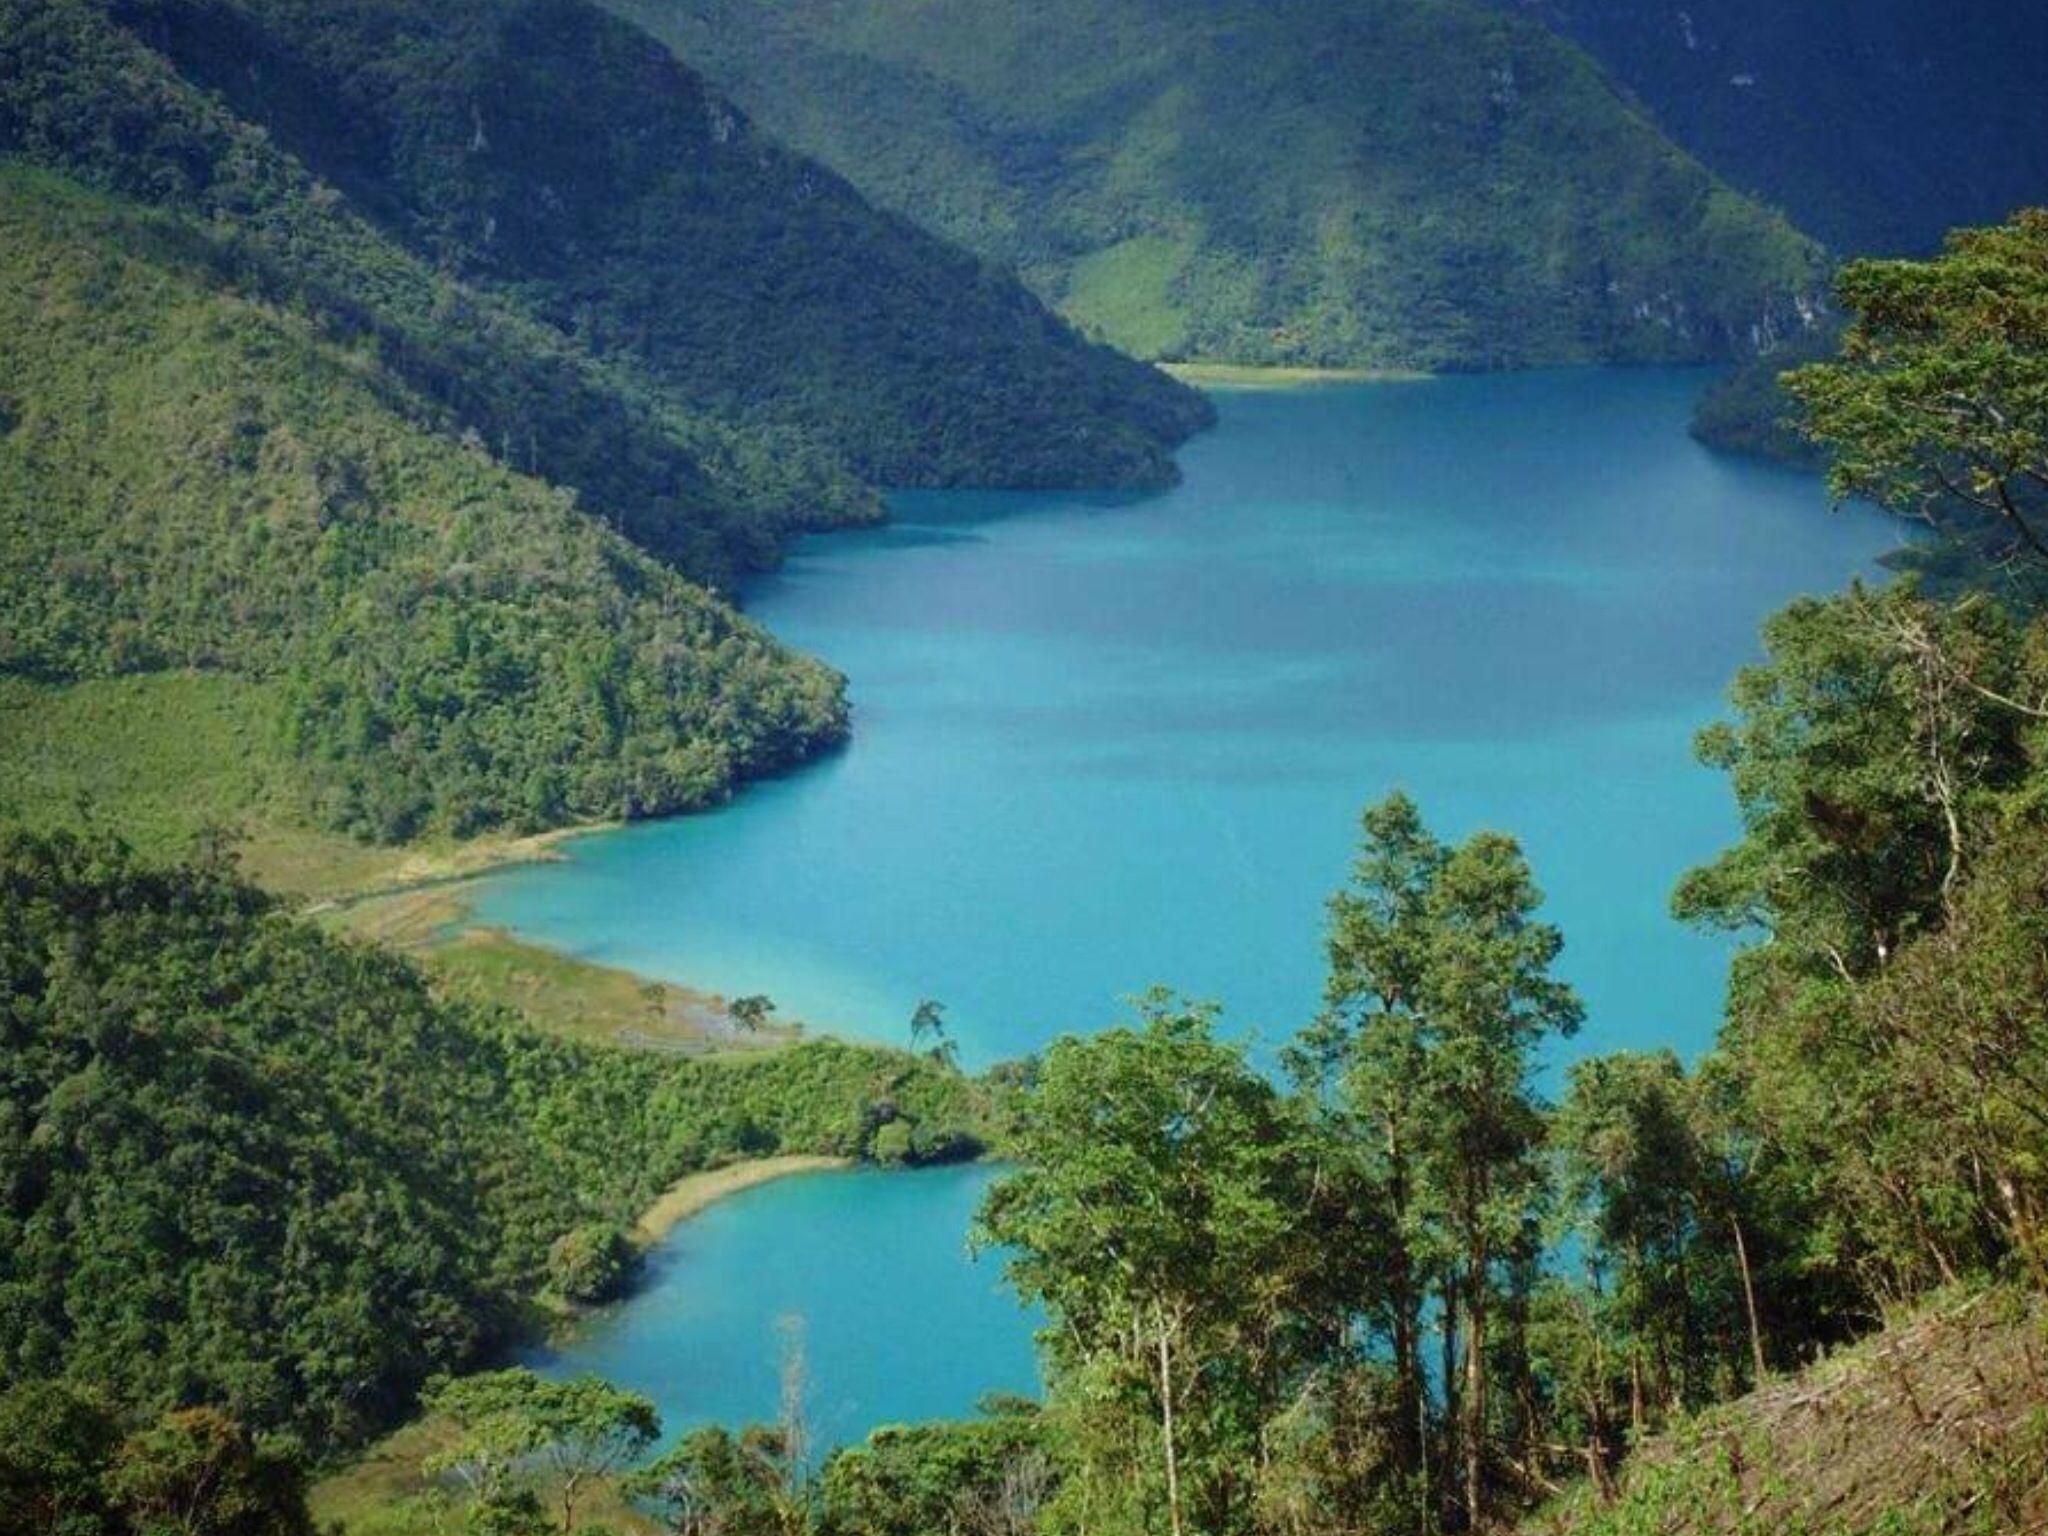 Laguna Brava en Nenton, Huehuetenango | Guatemala, Nature, Landscape